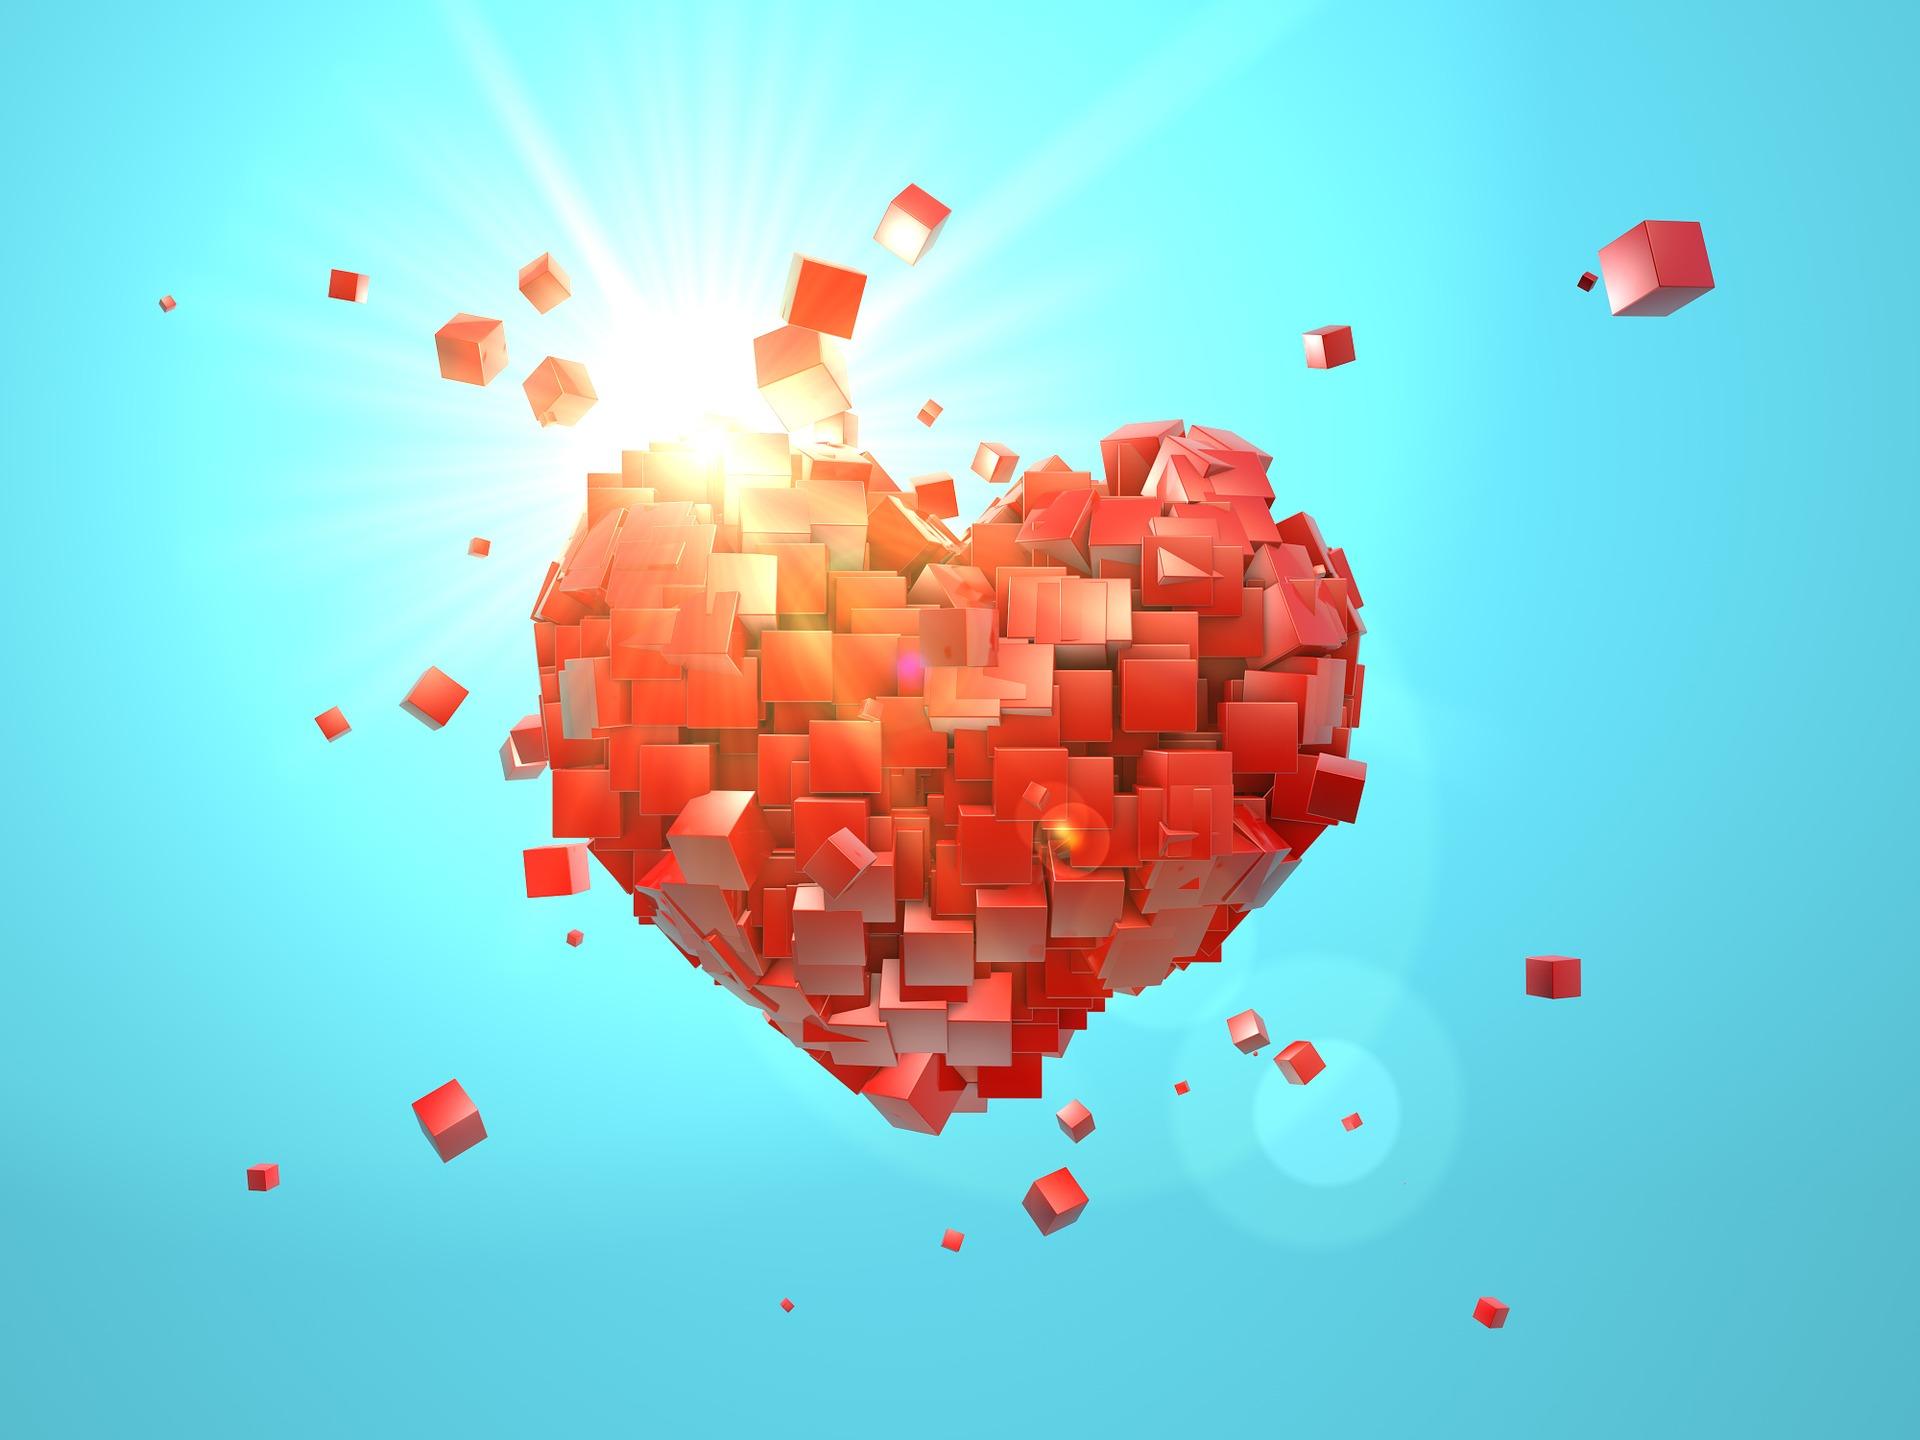 heart-1463421_1920